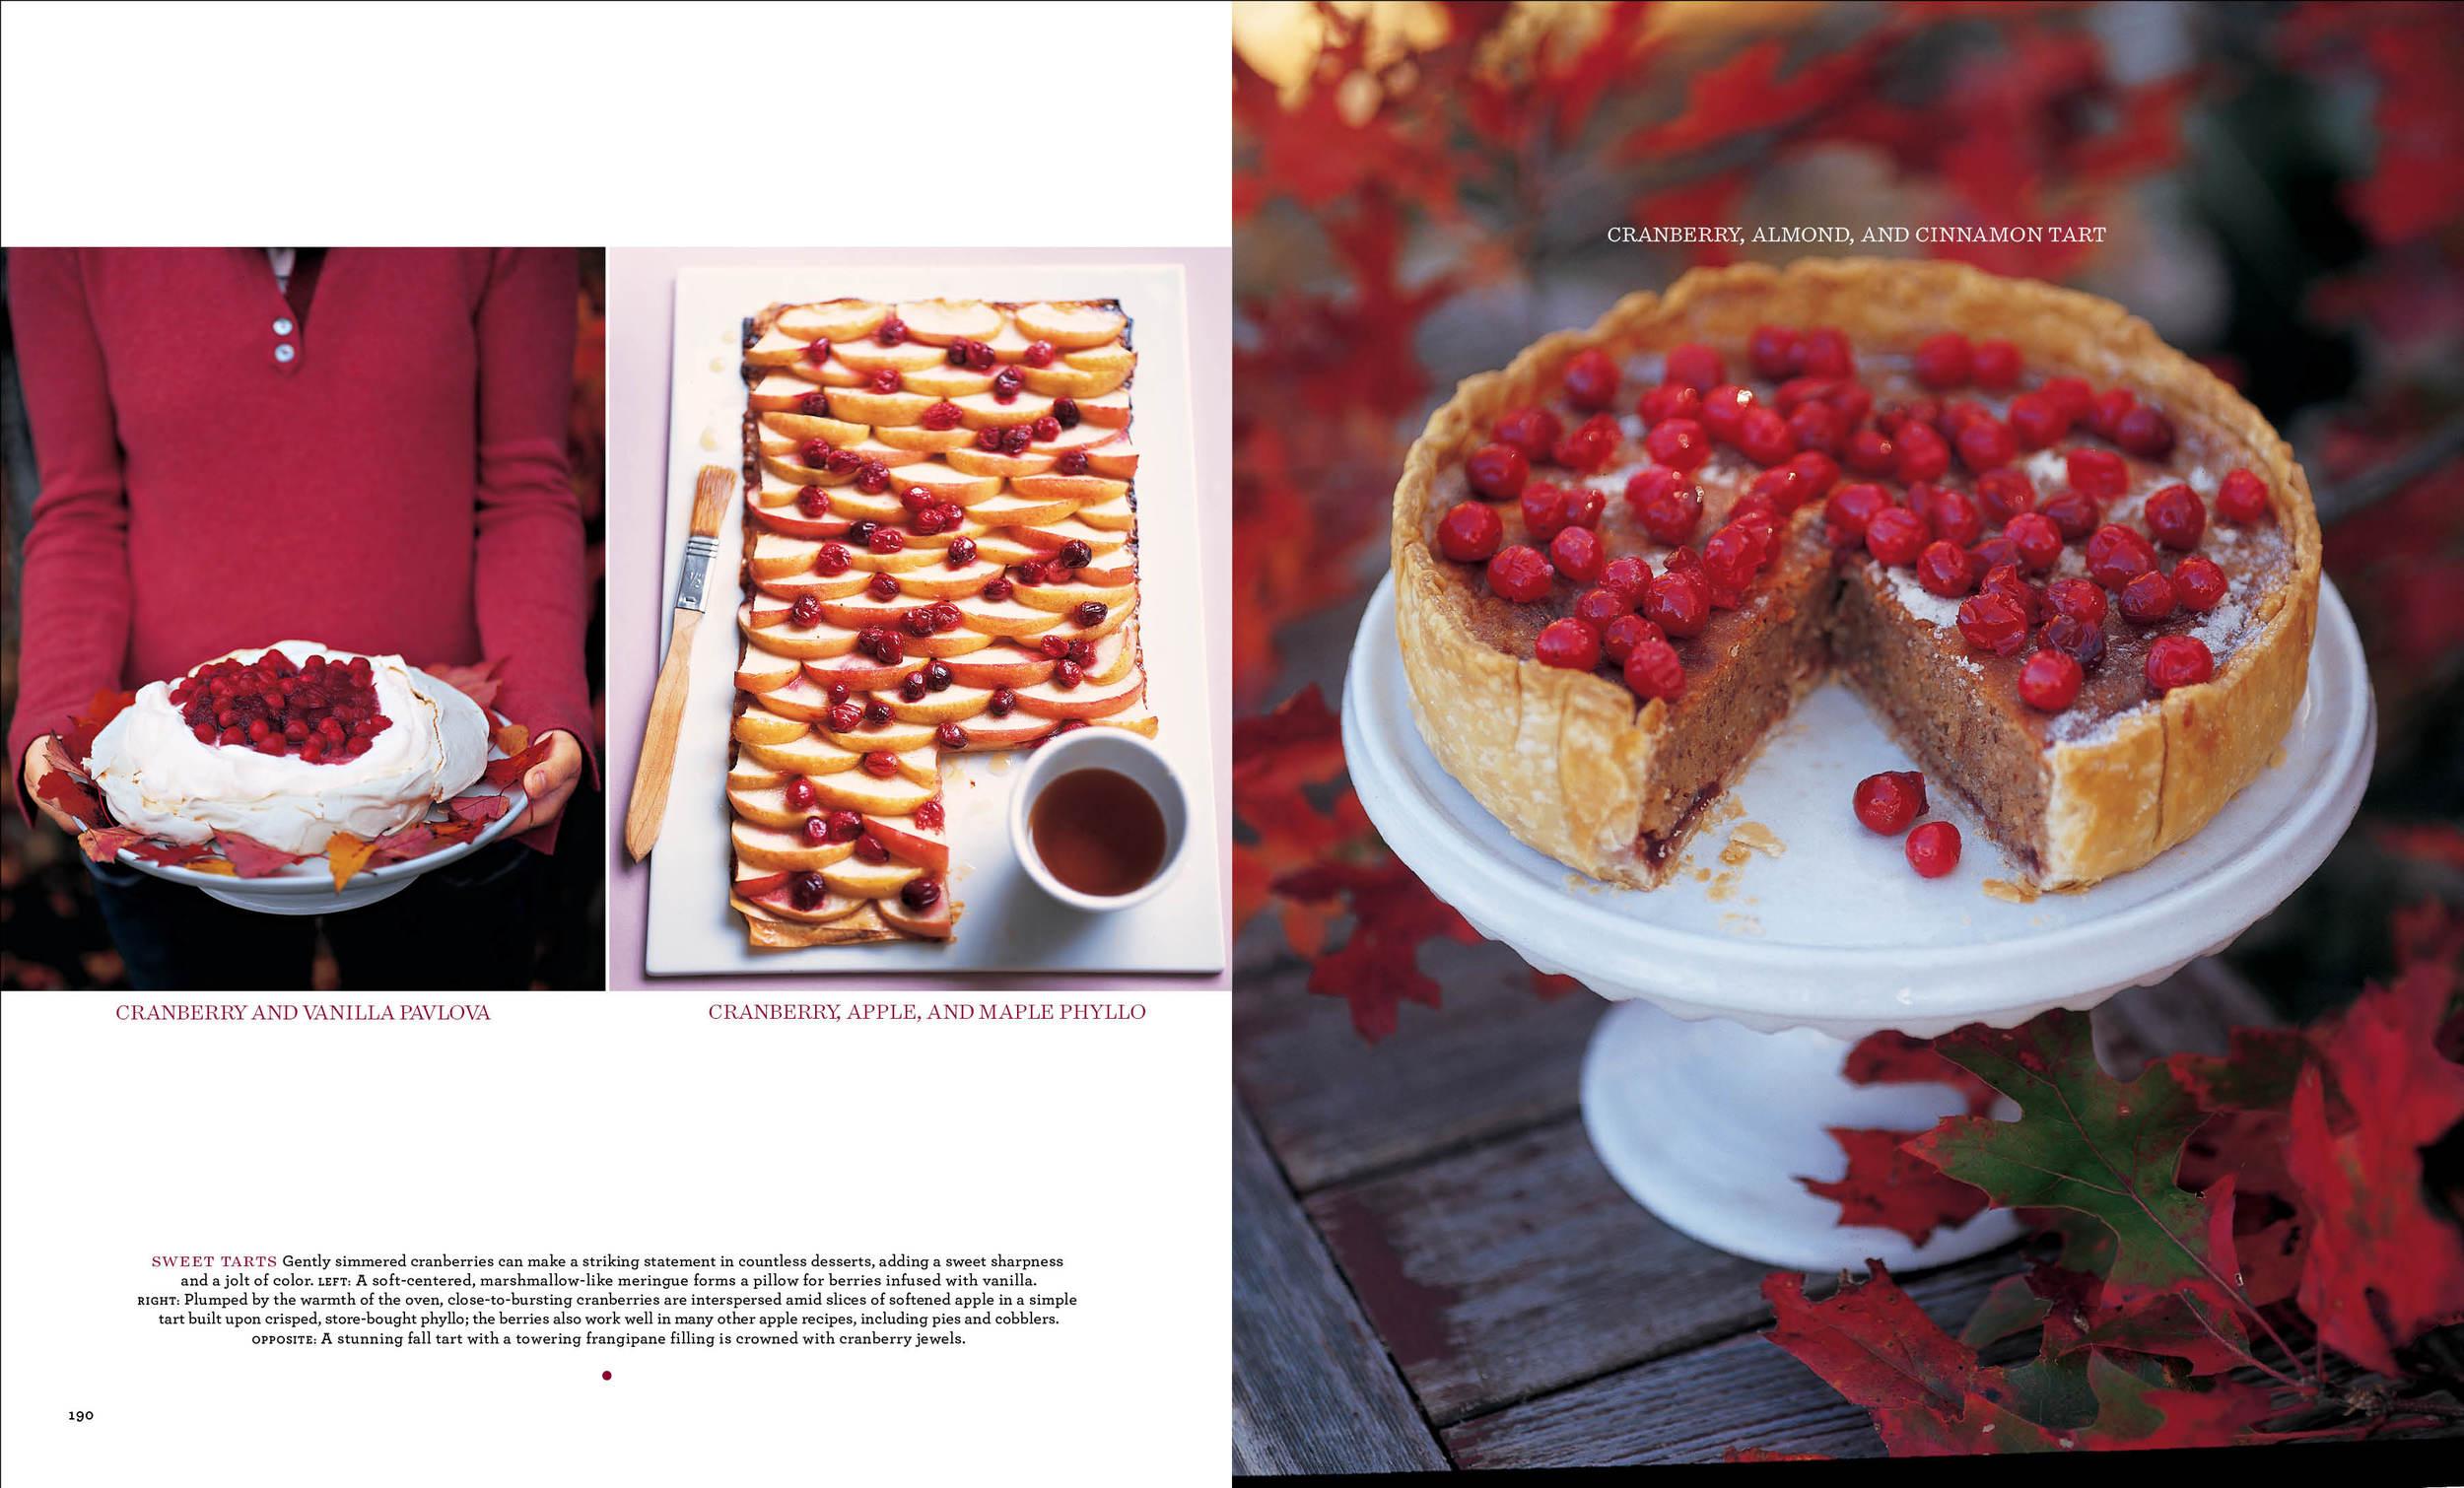 Cranberries3 copy.jpg